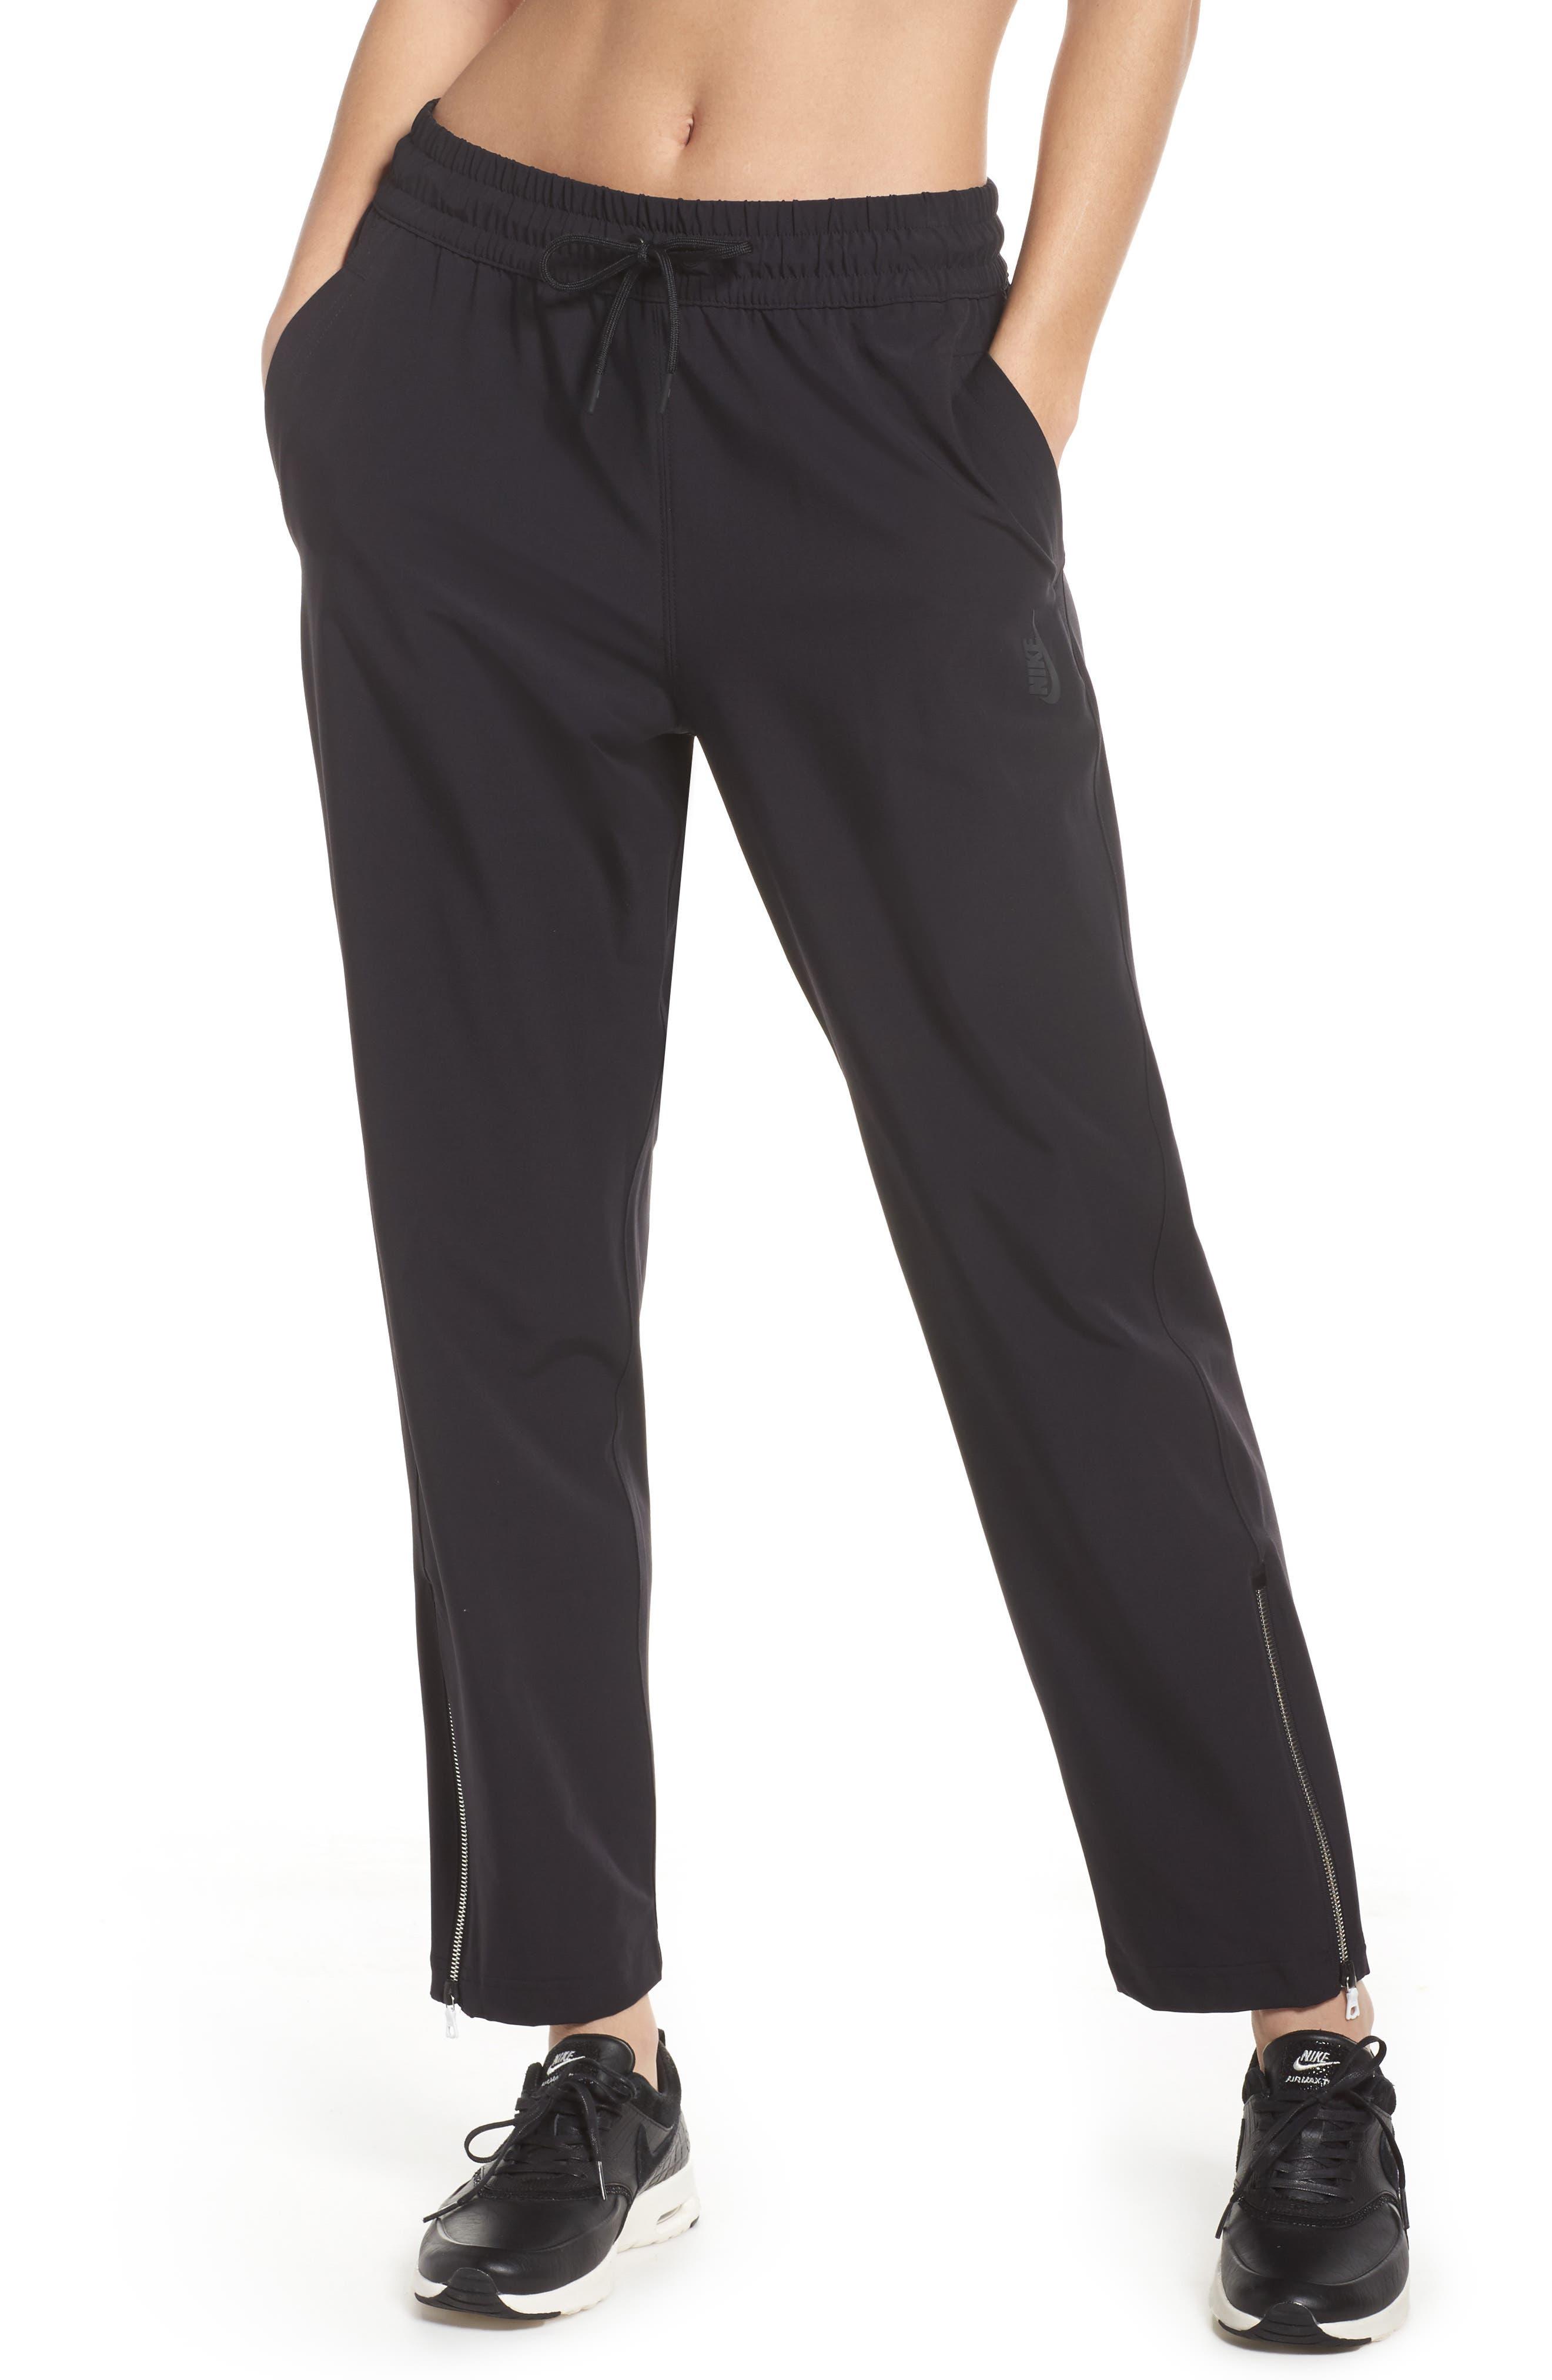 NikeLab Stretch Woven Training Pants,                             Main thumbnail 1, color,                             Black/ Black